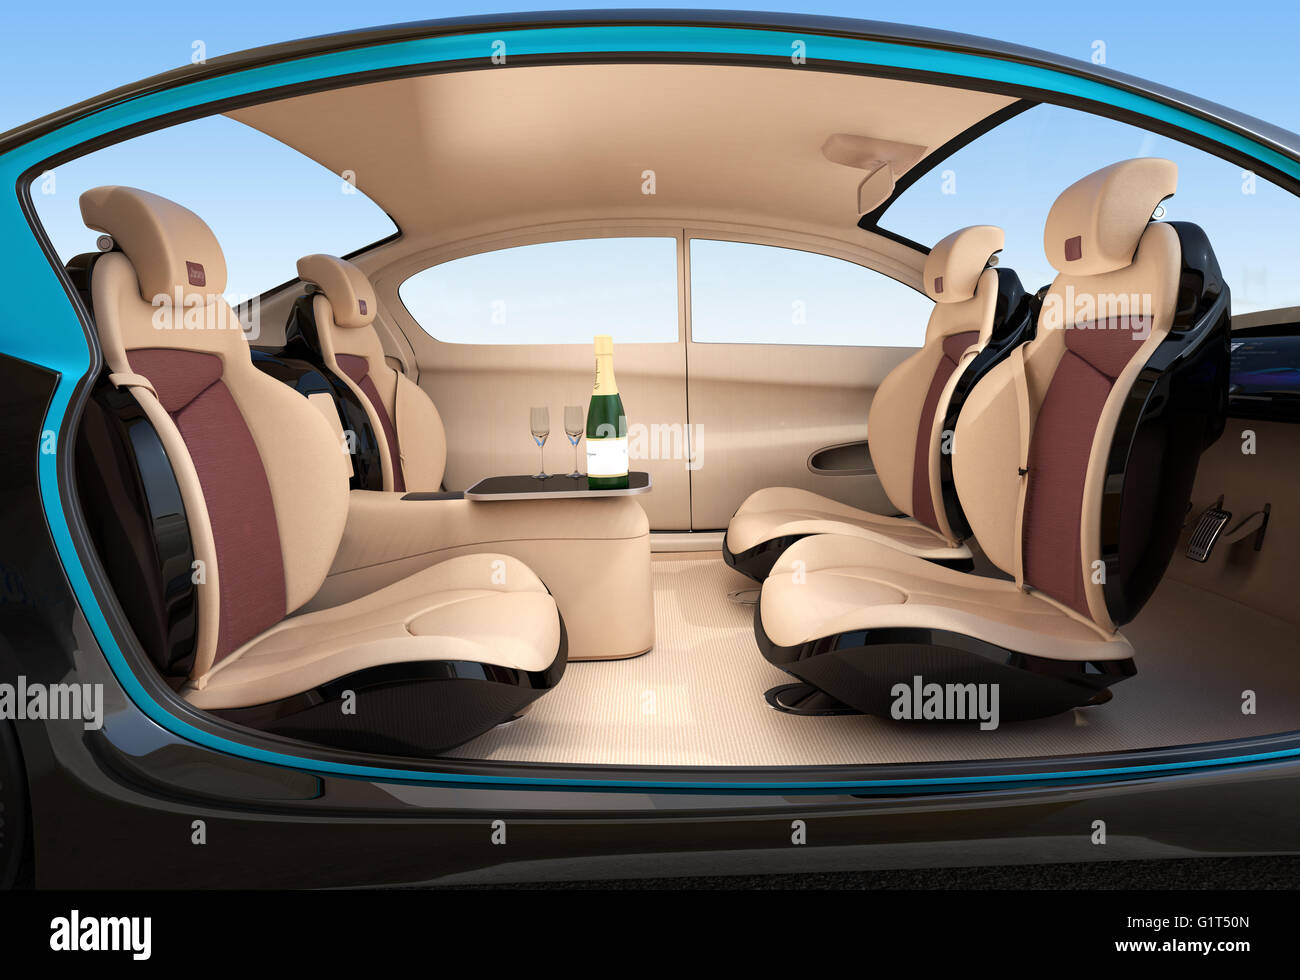 autonomous car interior concept luxury interior serve cool drink stock photo 104407653 alamy. Black Bedroom Furniture Sets. Home Design Ideas